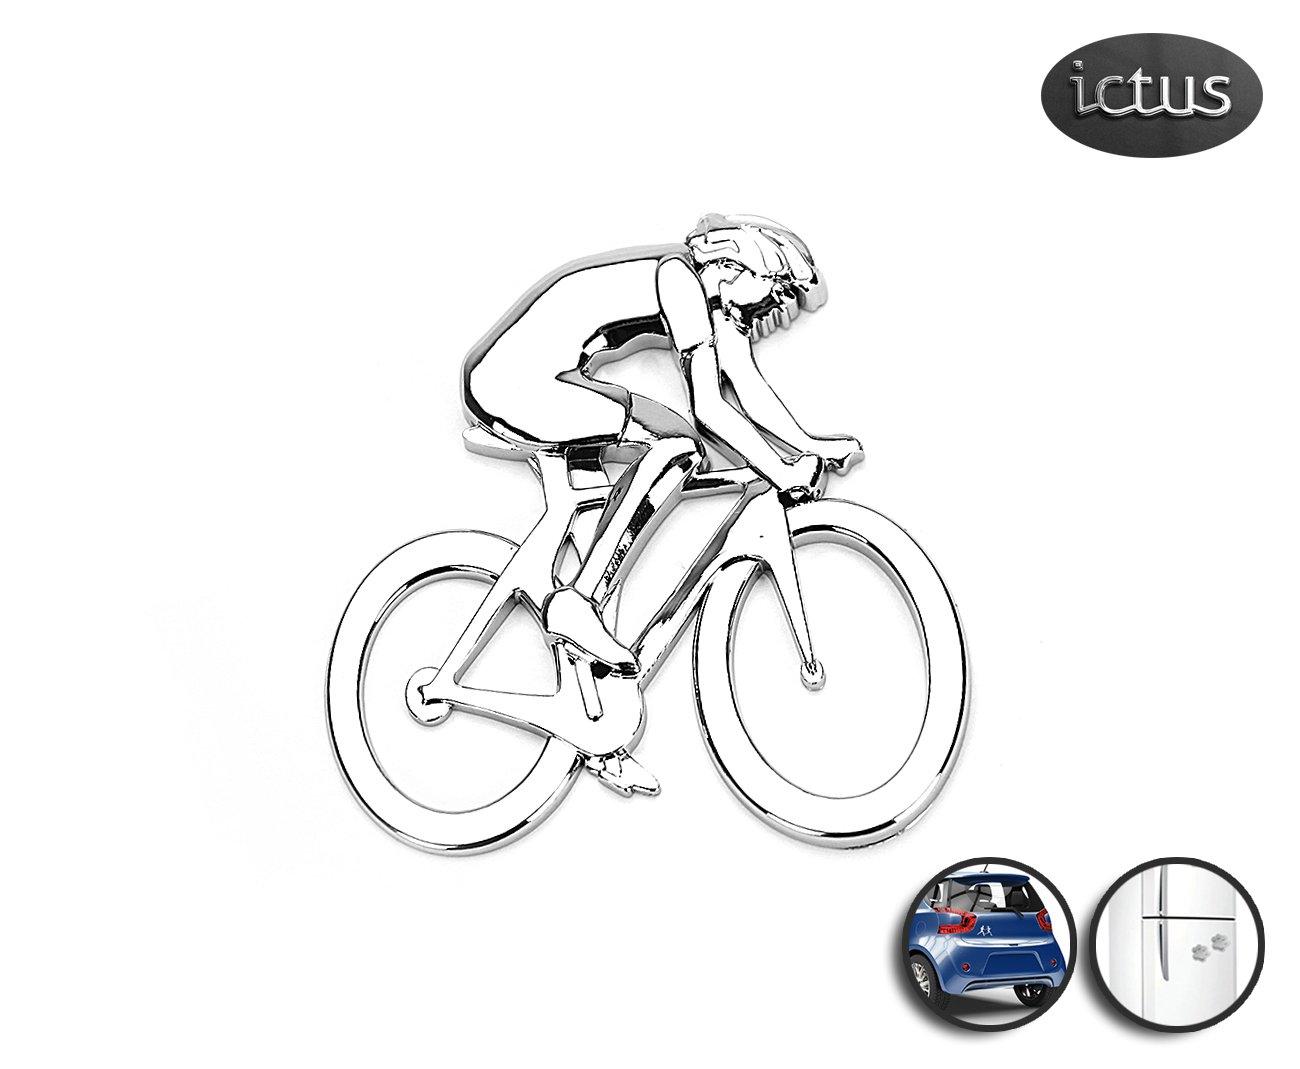 Emblema Ciclista - Ictus